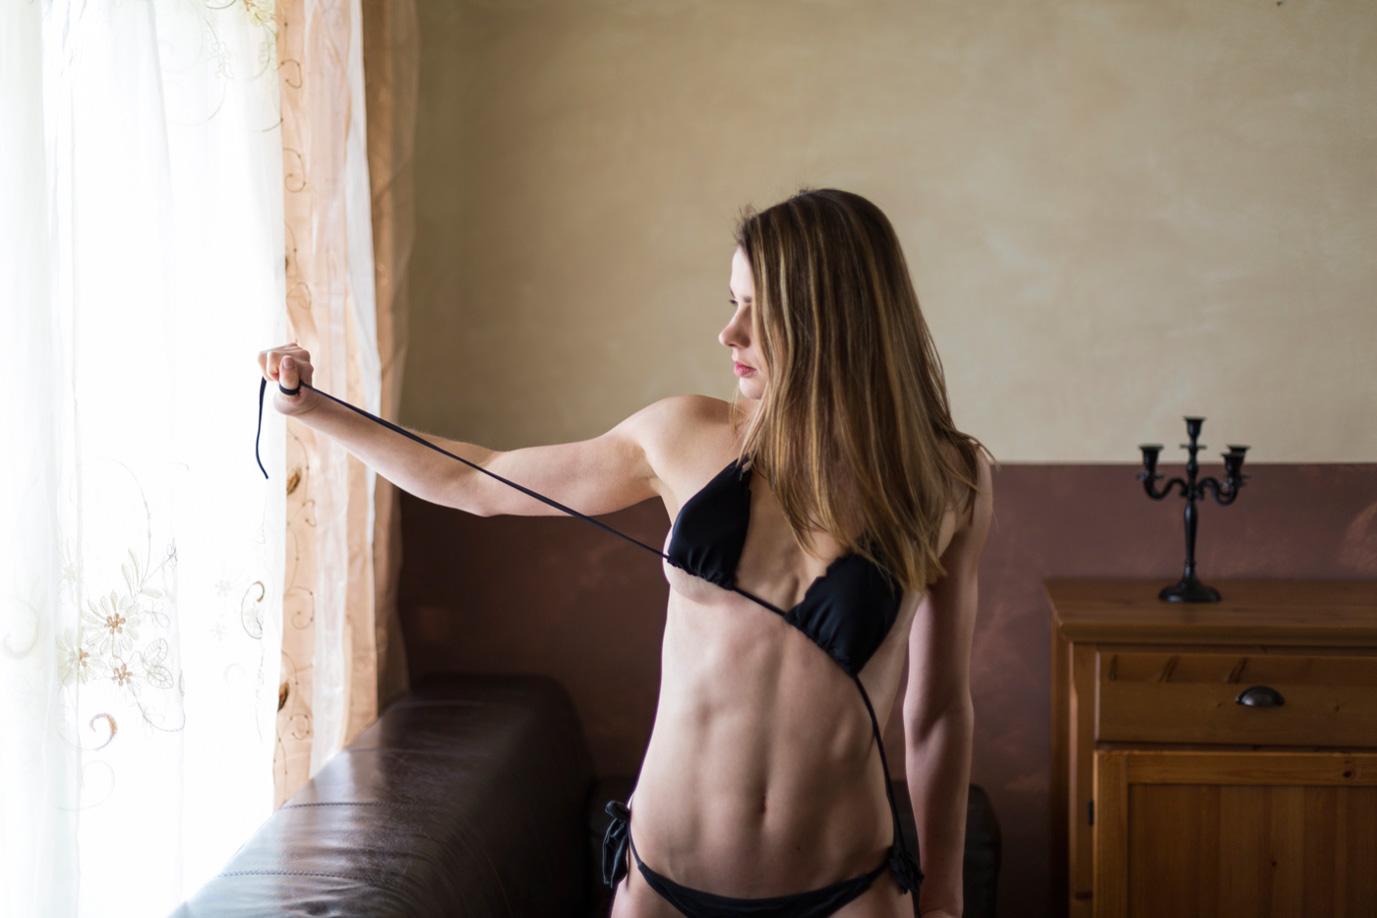 Юлия Николь / Julia Nicole nude by Johan Famel - Lions Magazine